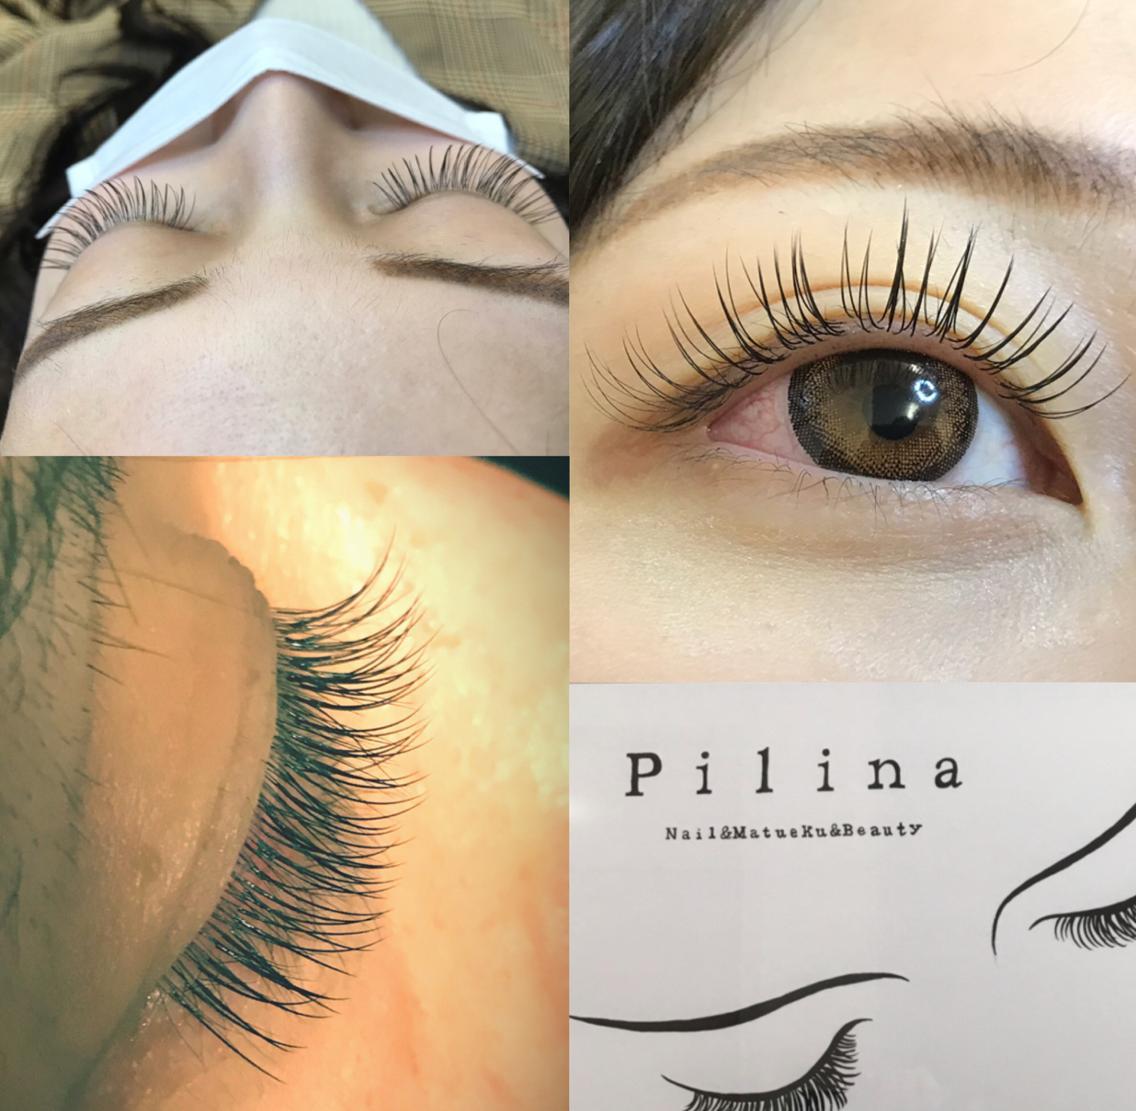 pilina 【ピリナ】 by Home salon Ace所属・Pilina☆の掲載